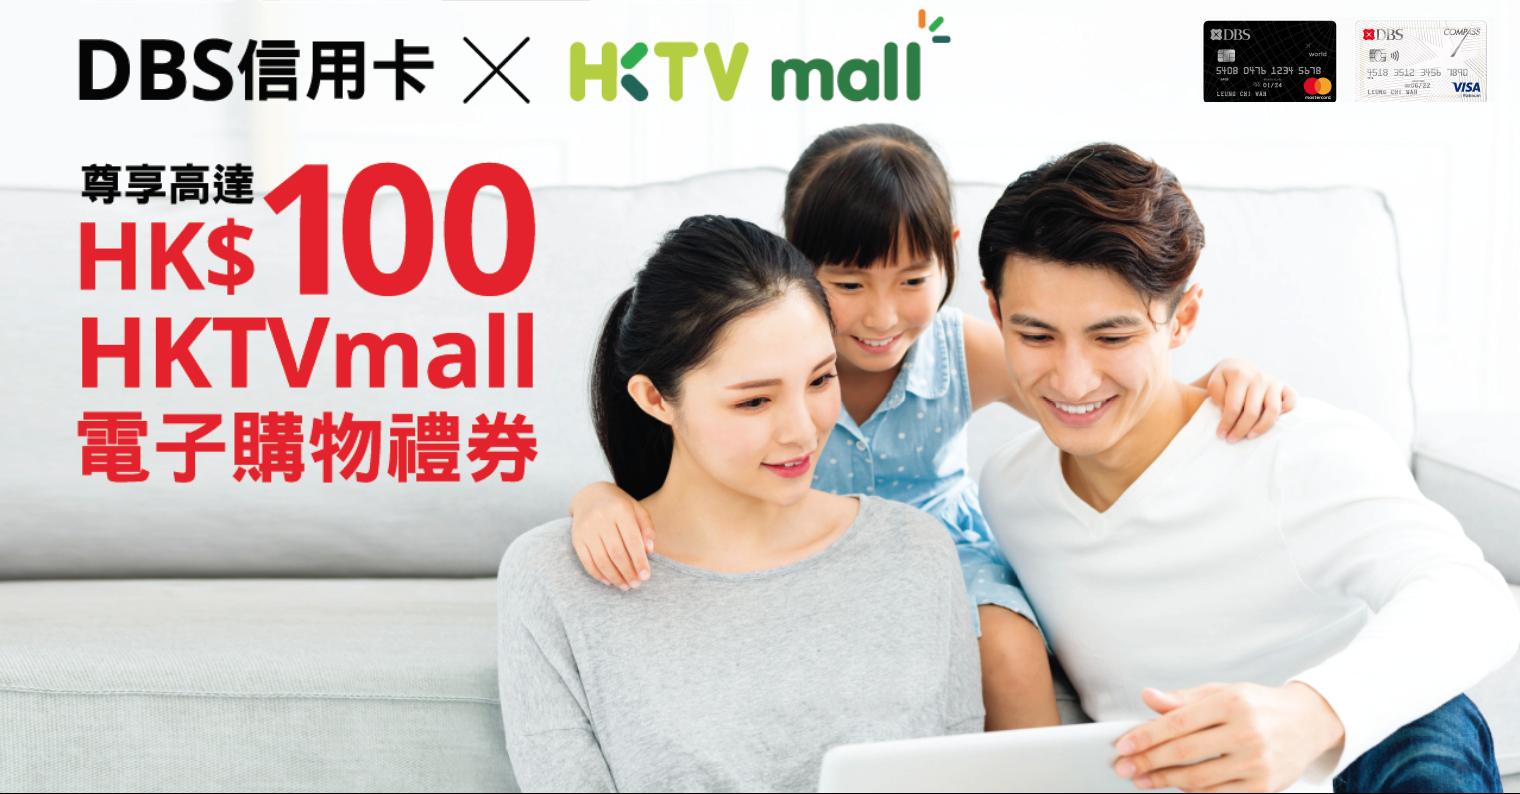 DBS信用卡高達HK$100 HKTVmall電子購物禮券優惠!只限8月31日或之前!